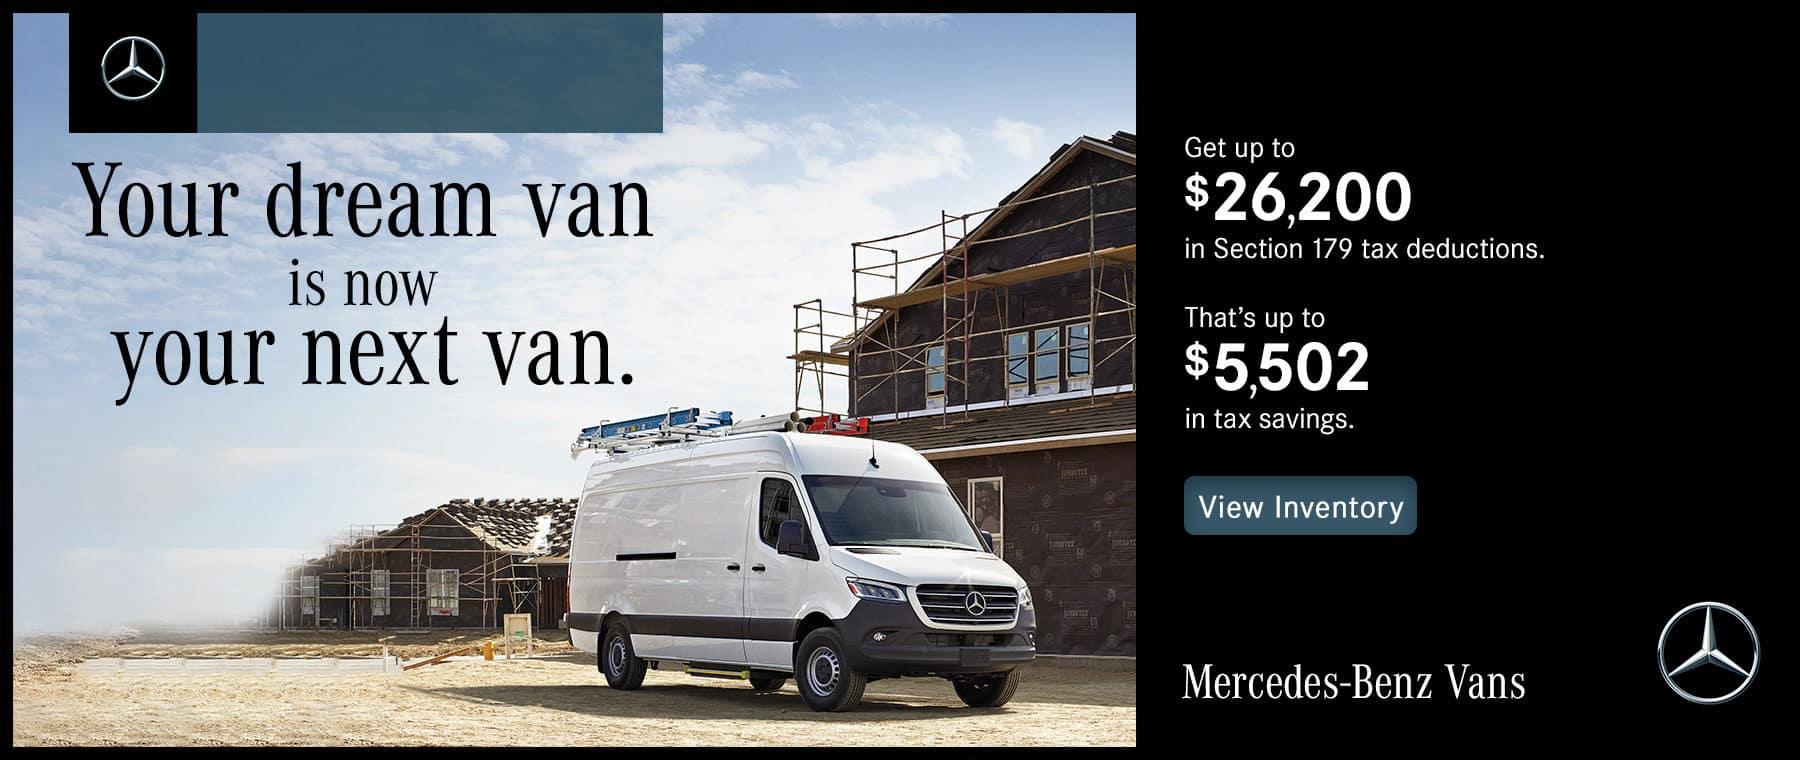 Mercedes-benz of San Diego mercedes benz vans specials